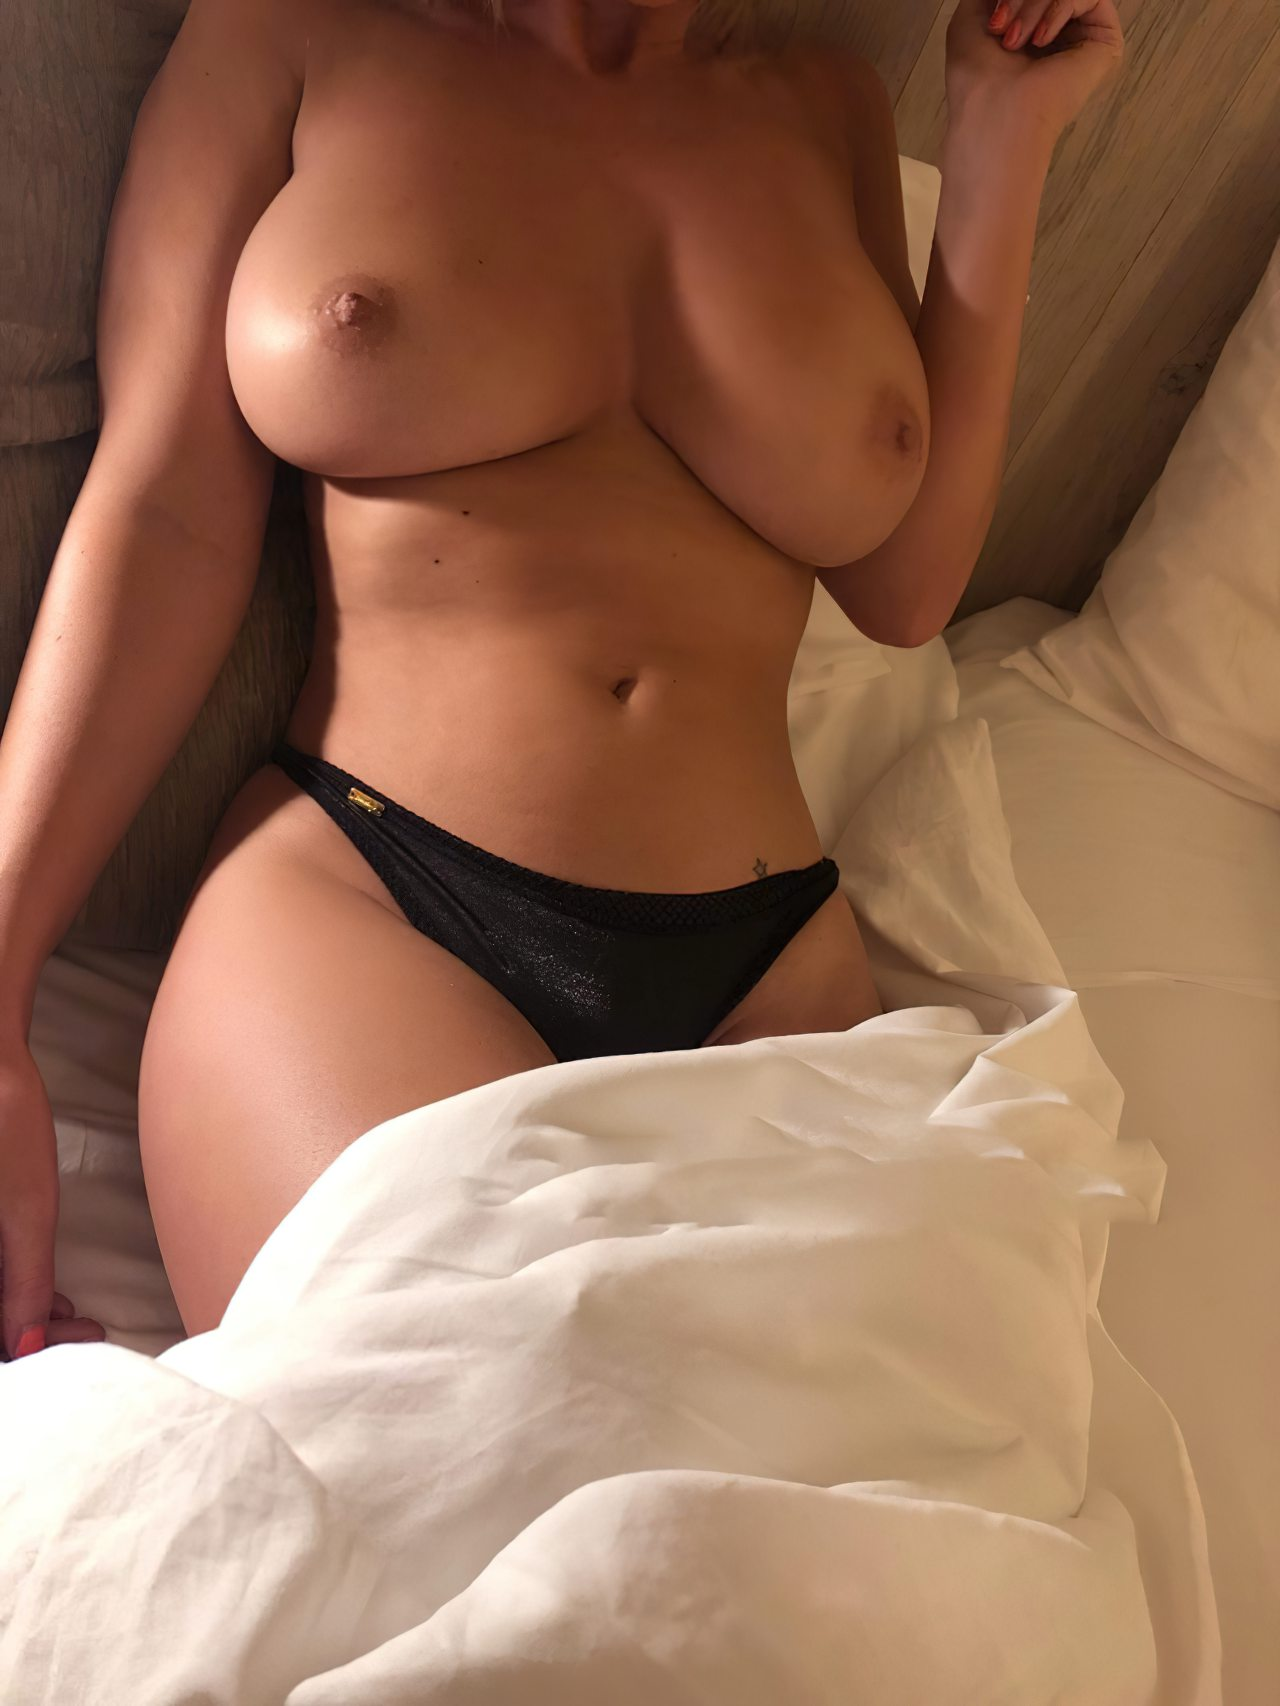 Mulheres Despidas (40)